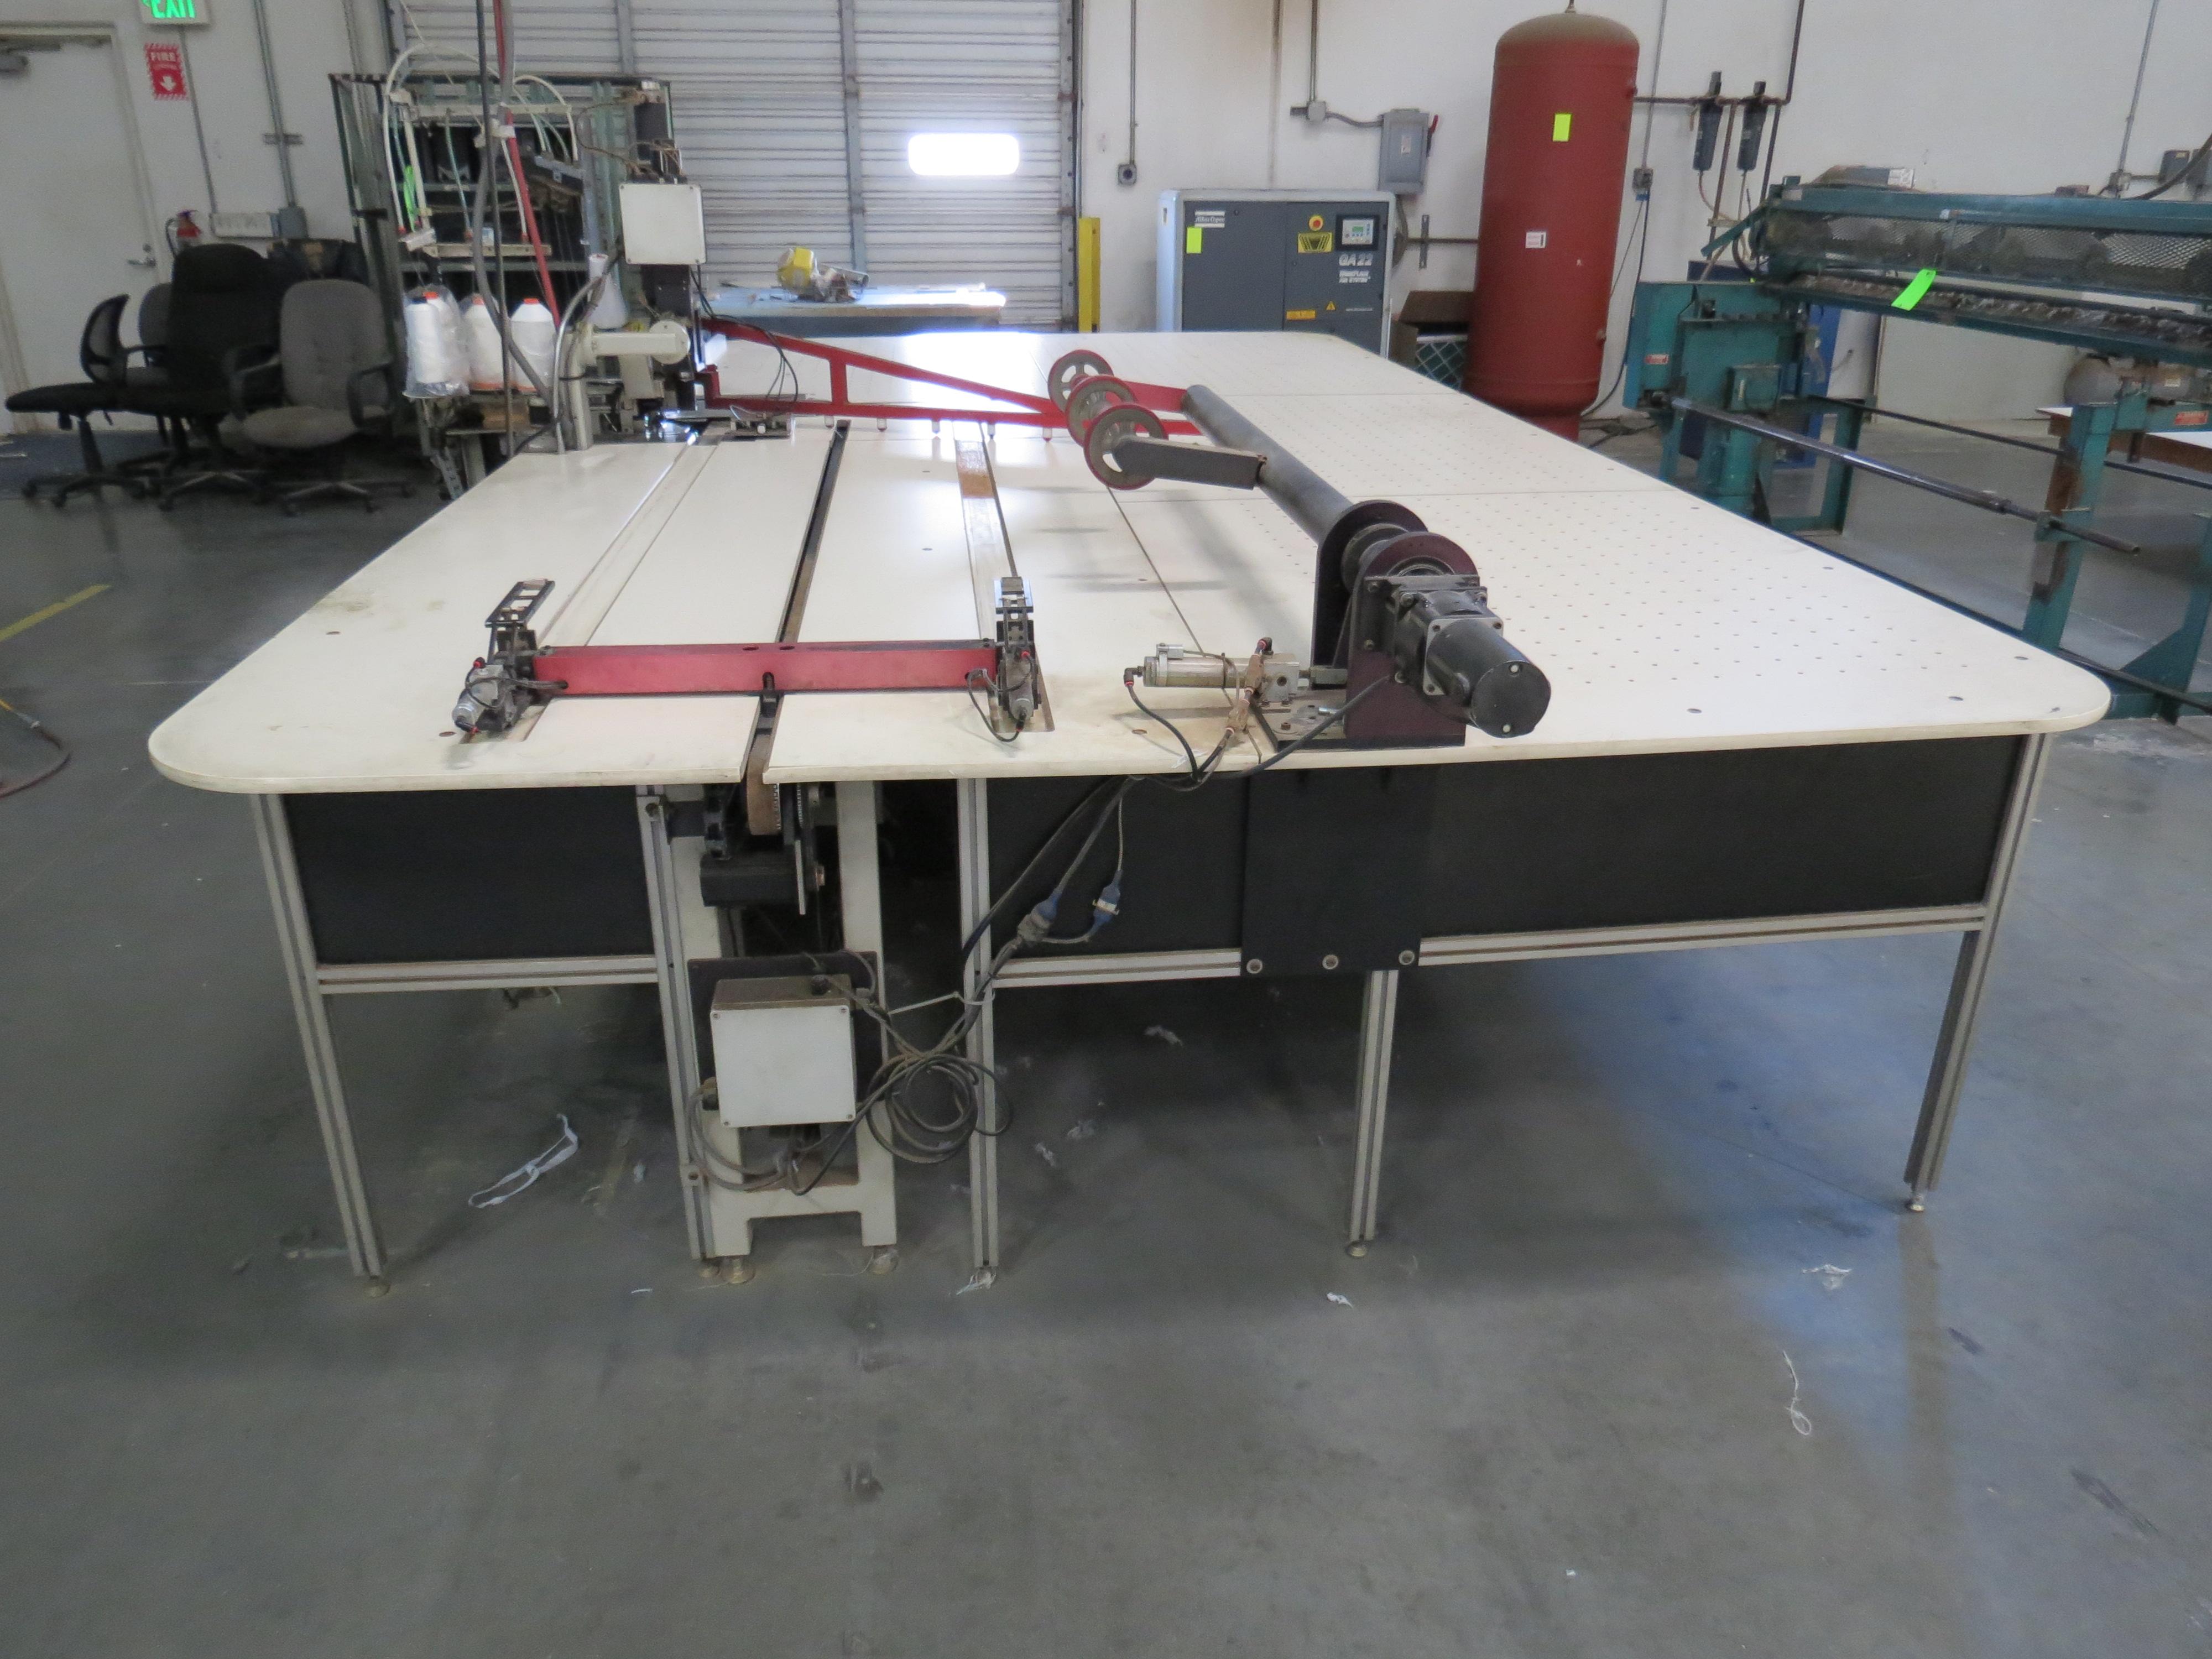 Porter International ATA 4000Panel Flange Master, 220V, SN:S2716 - Image 3 of 3